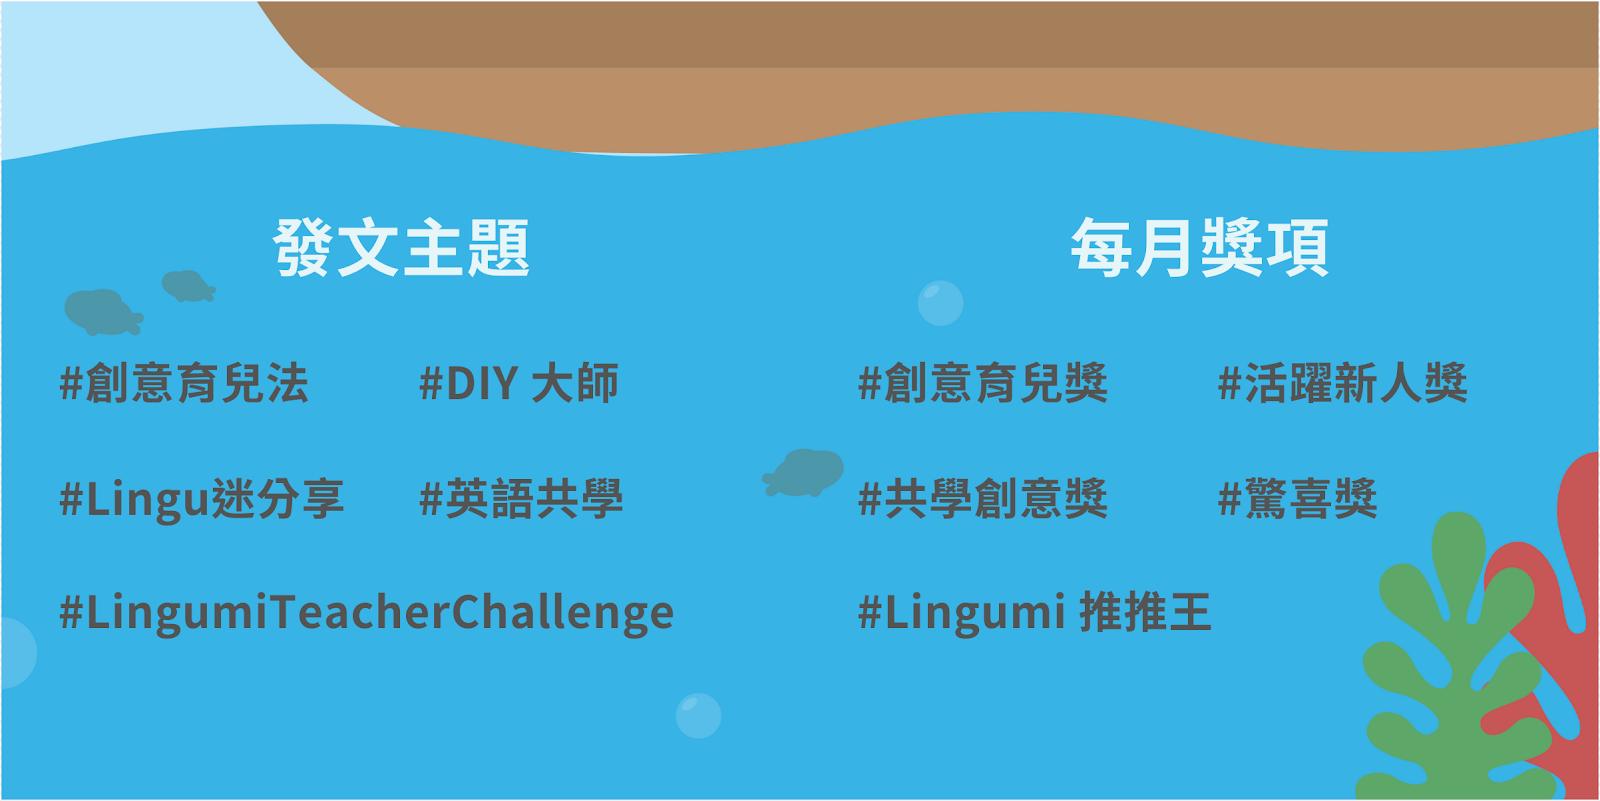 Lingumi 社群